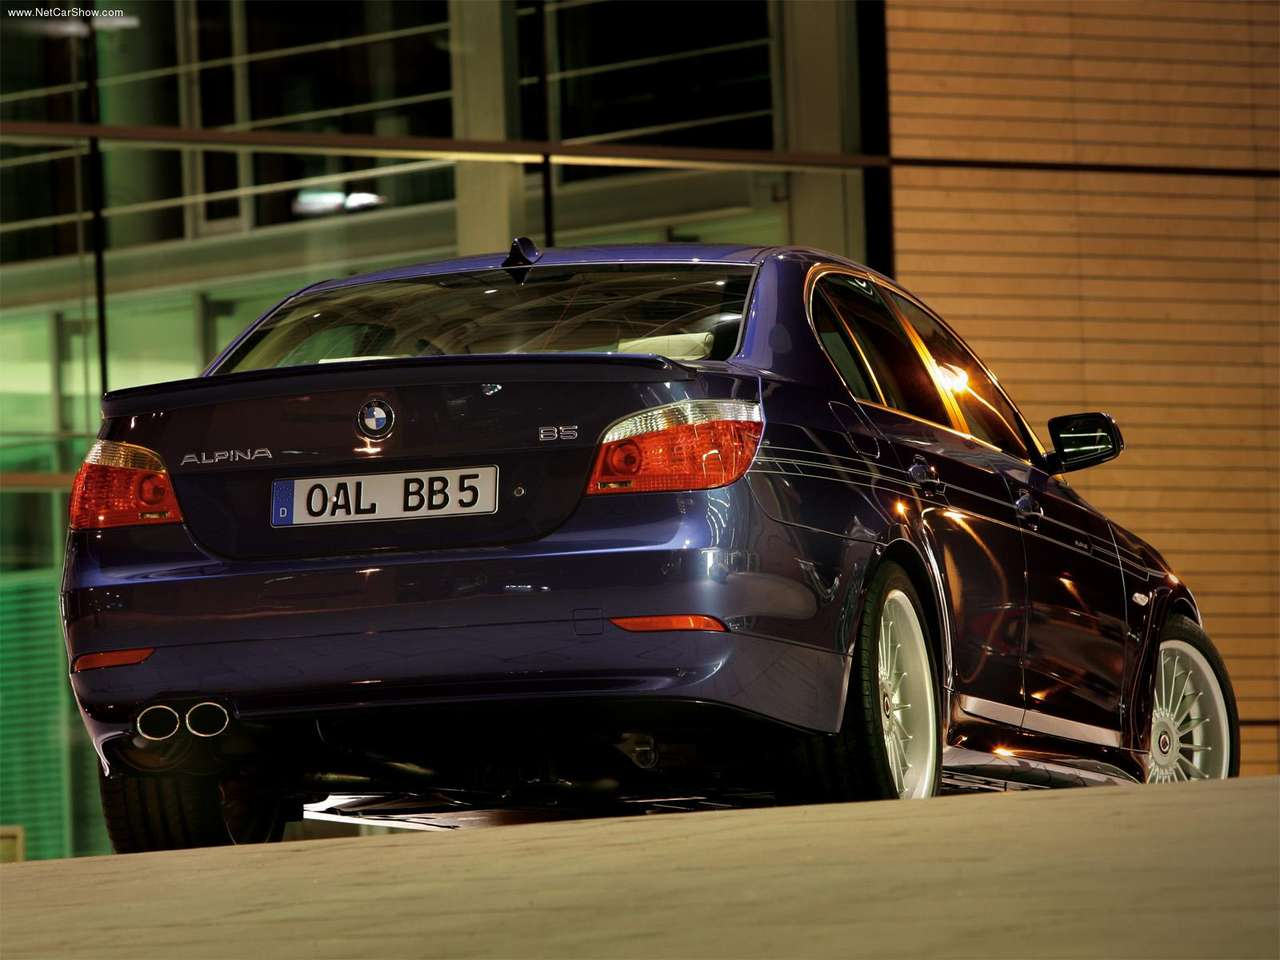 Alpina BMW B5 2005 Alpina-BMW_B5-2005-1280-02